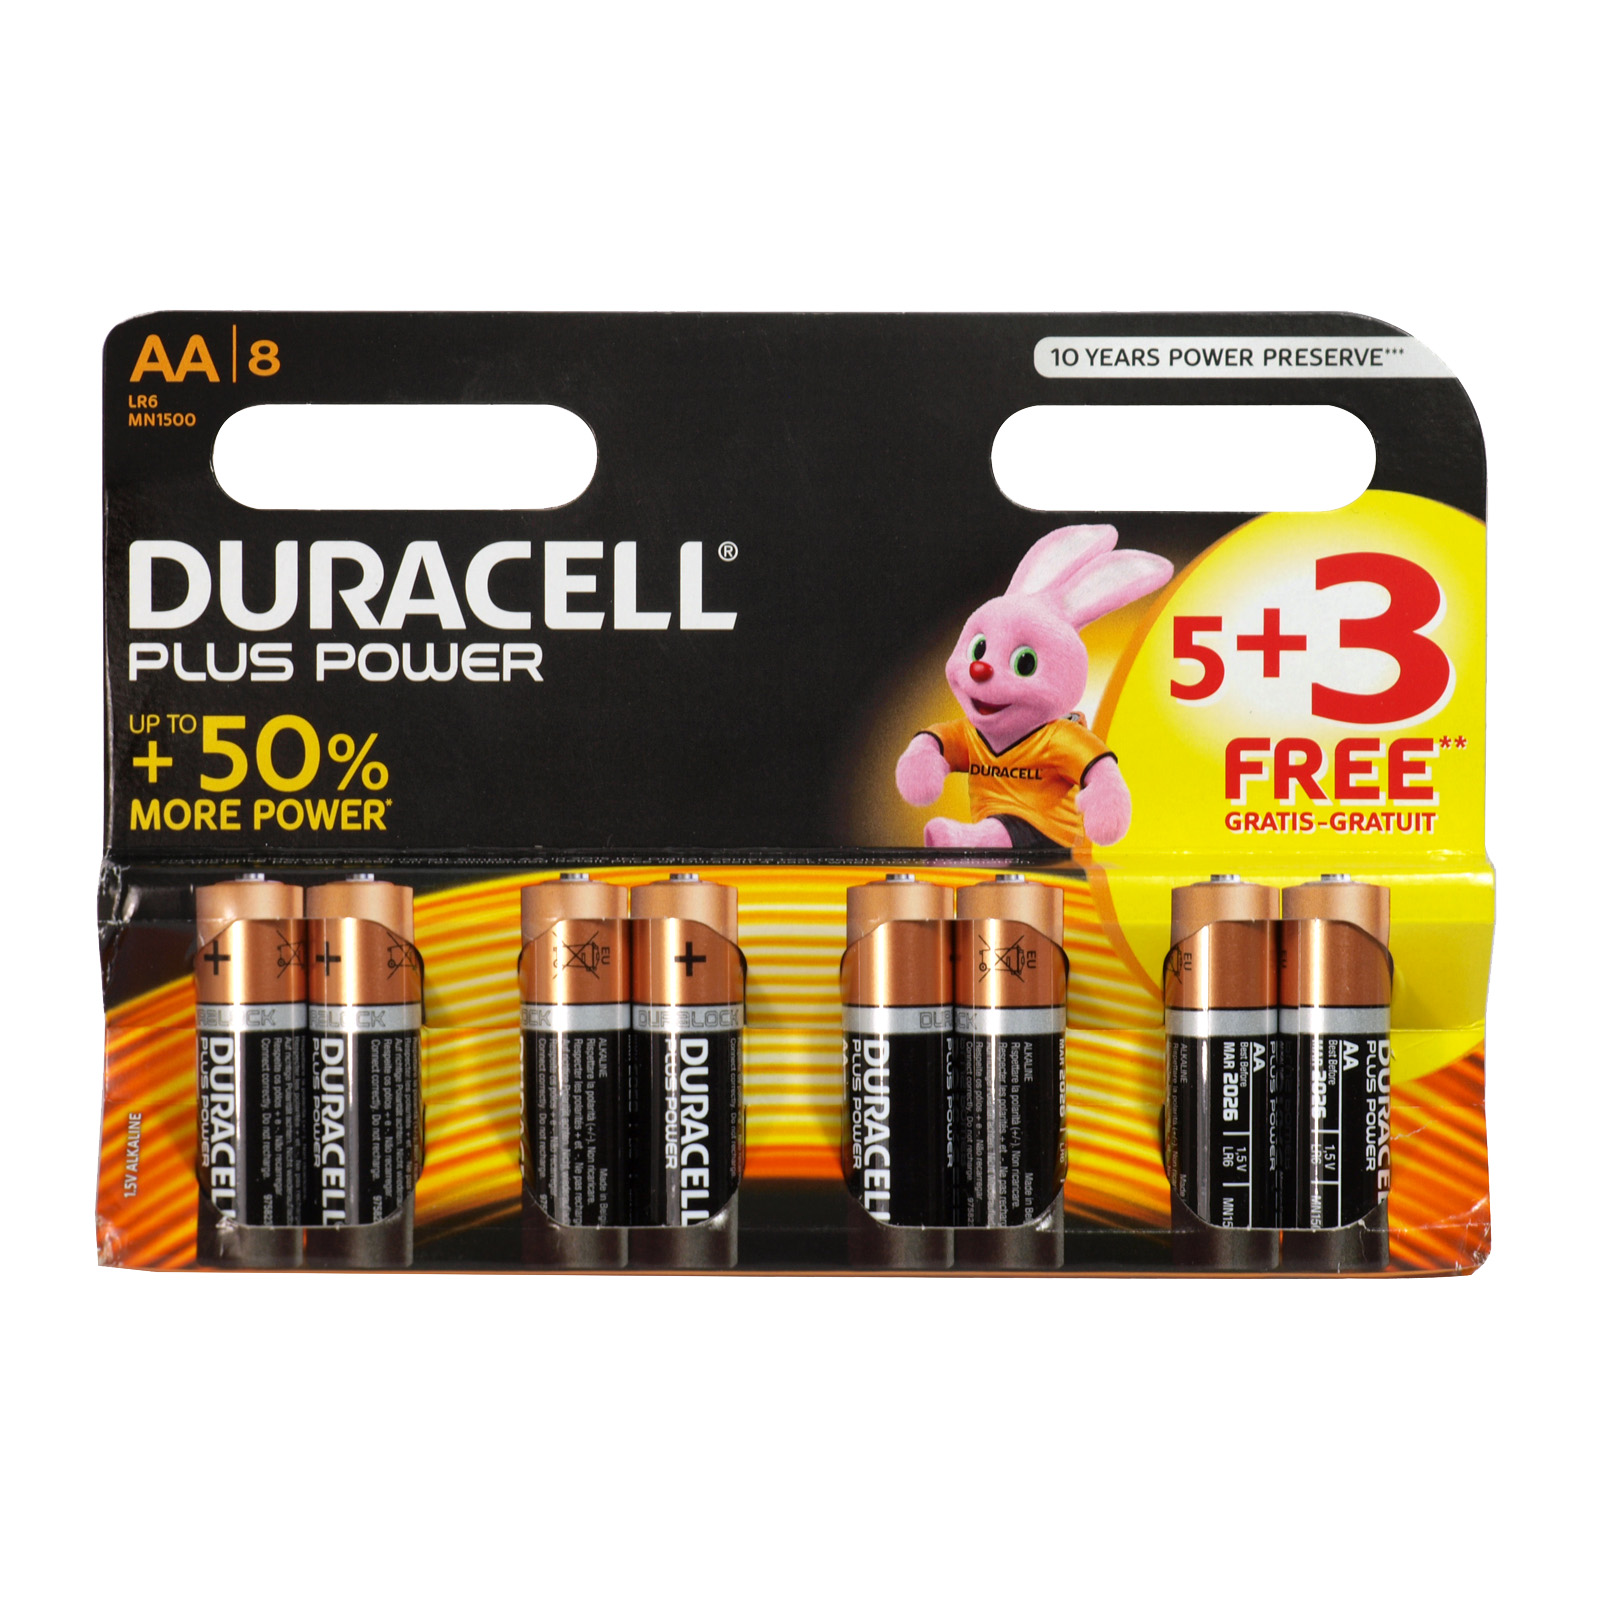 DURACELL PLUS POWER 5+3 FOC AA